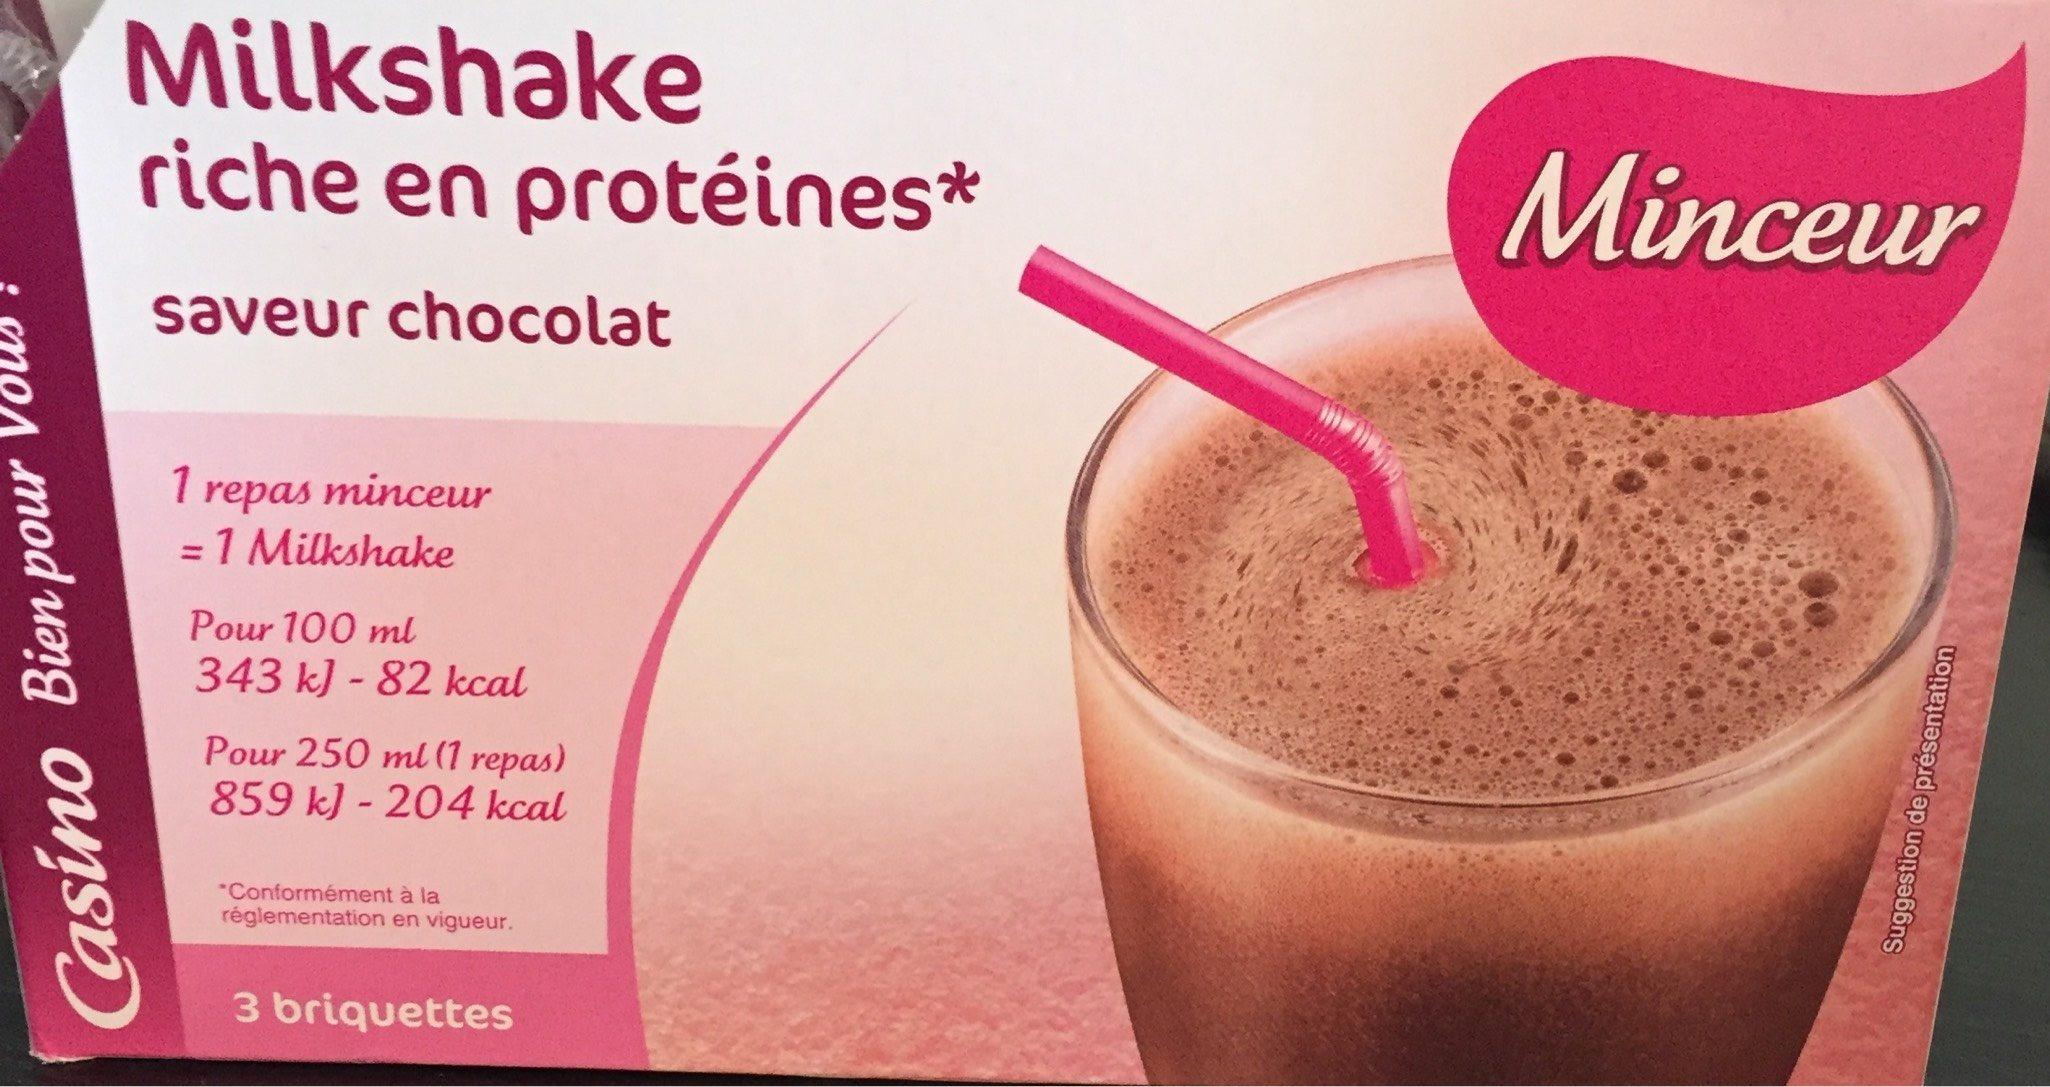 Milkshake Riche en Protéines Saveur Chocolat - Product